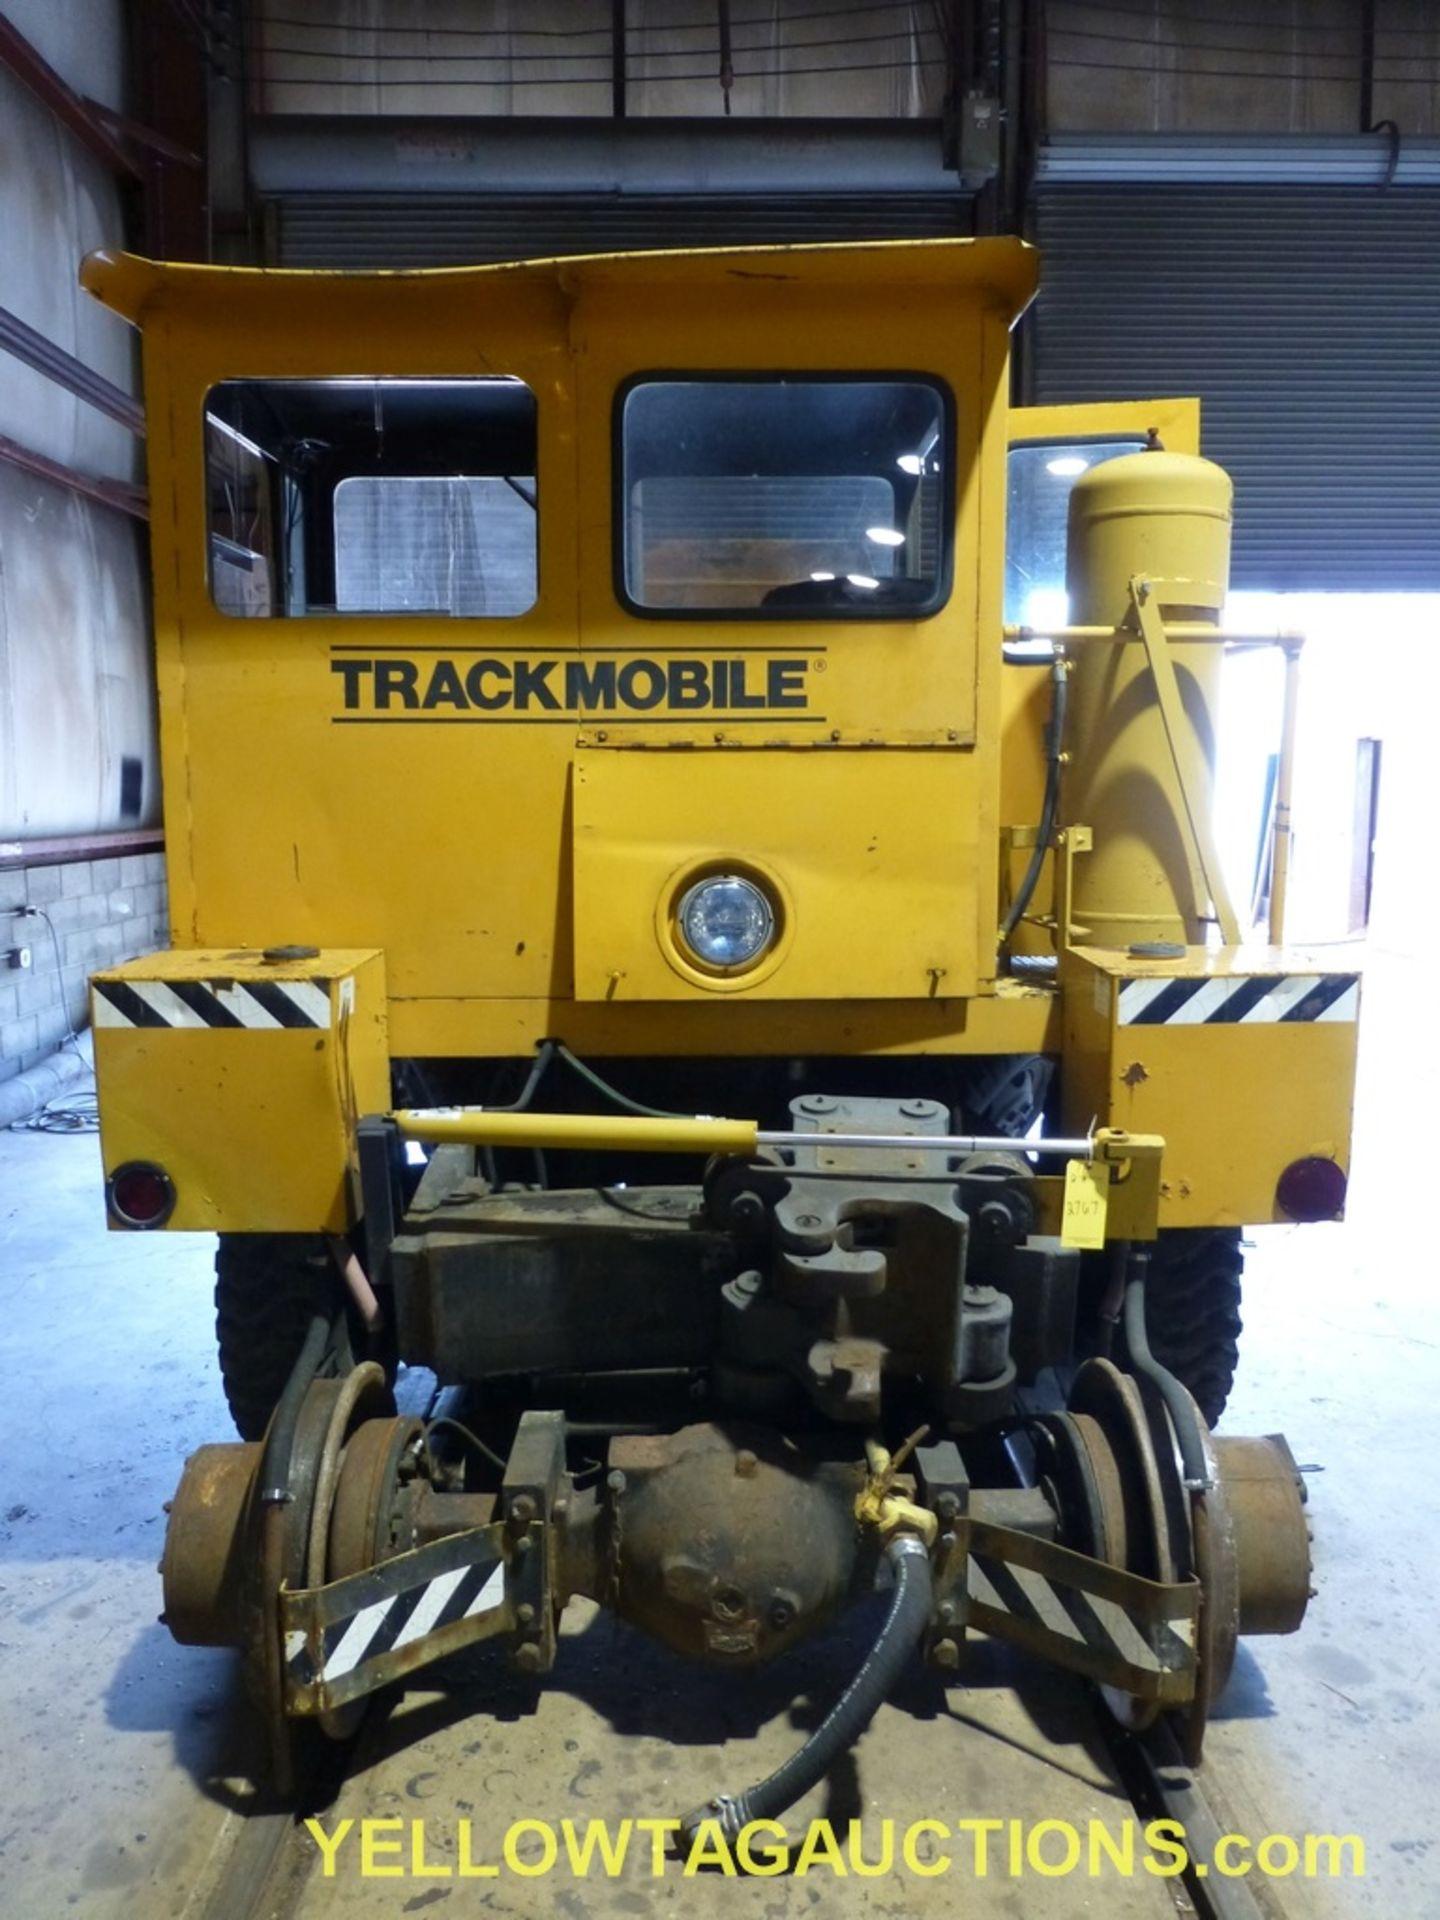 Track Mobile Rail Car Mover | Model No. 7TM; Bad Tie Rod - Image 3 of 42